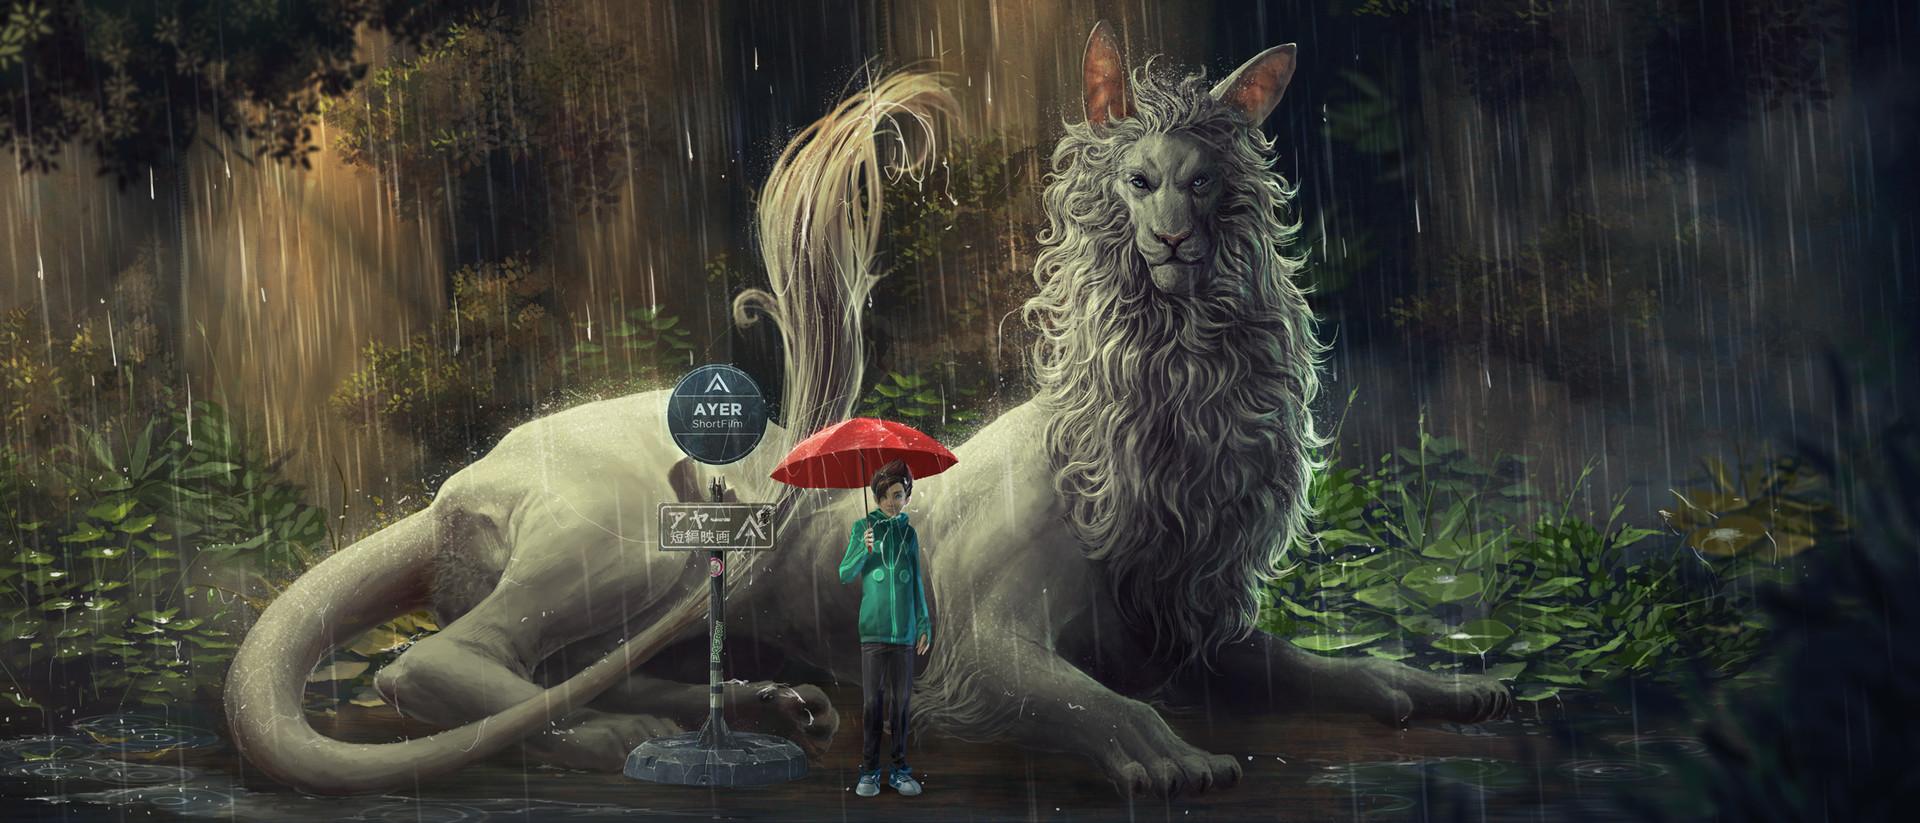 Kaithzer morejon poster matt dragon totoro 1